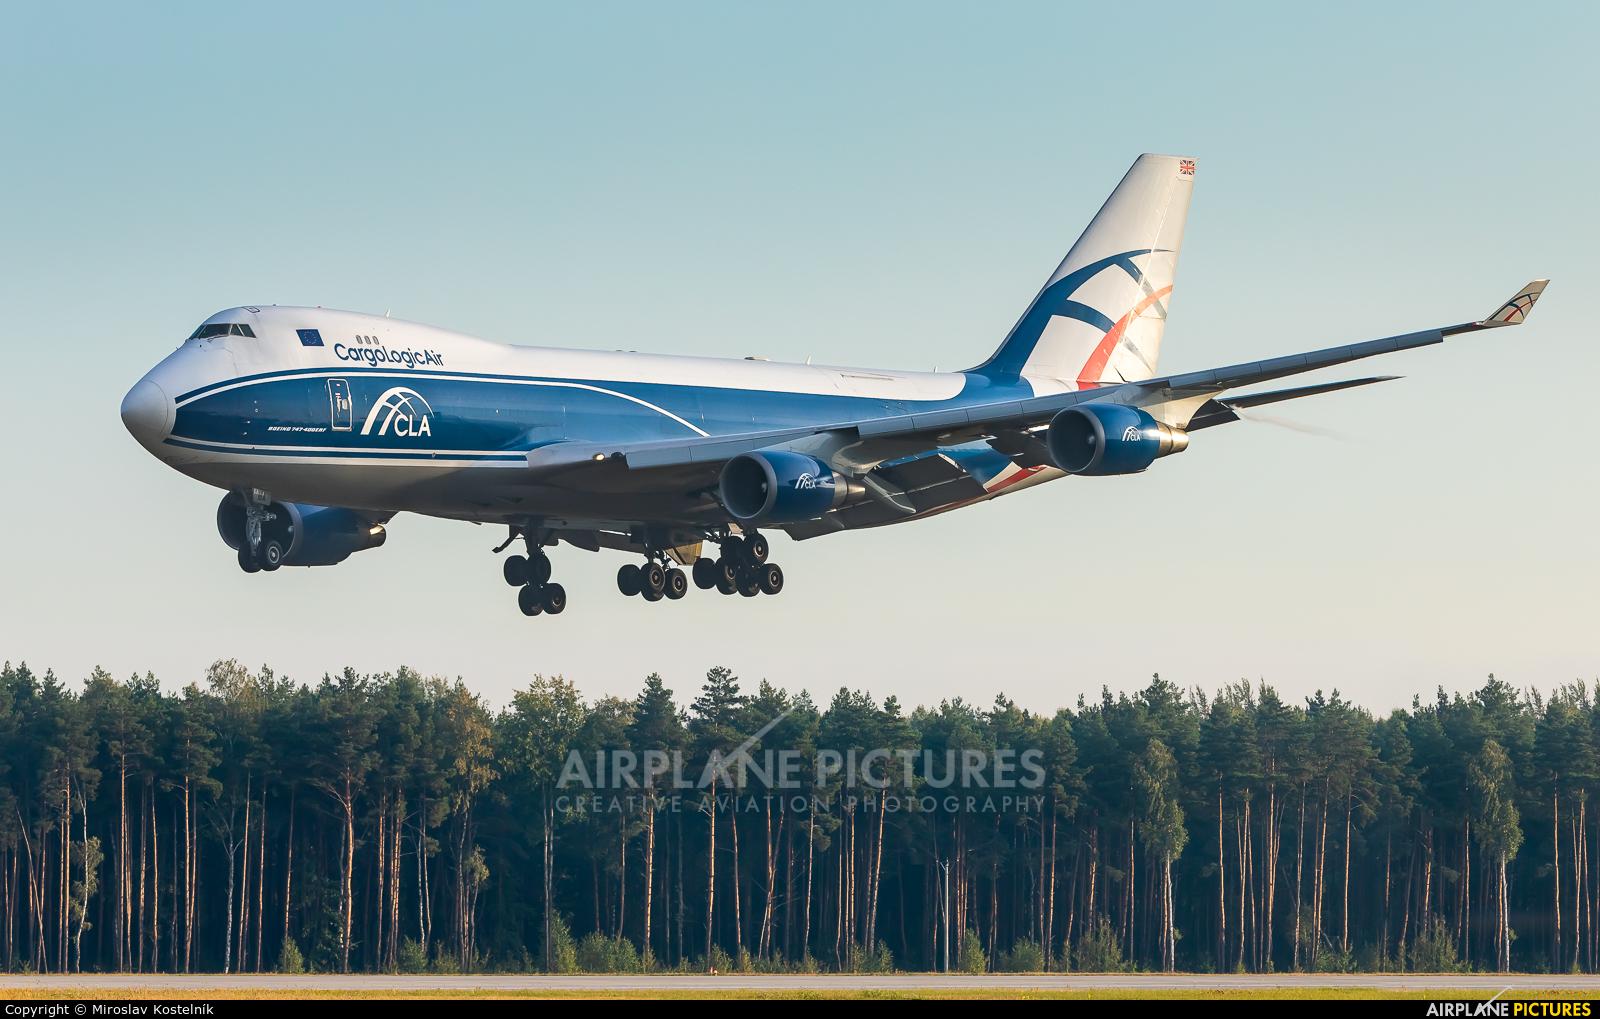 Cargologicair G-CLBA aircraft at Katowice - Pyrzowice